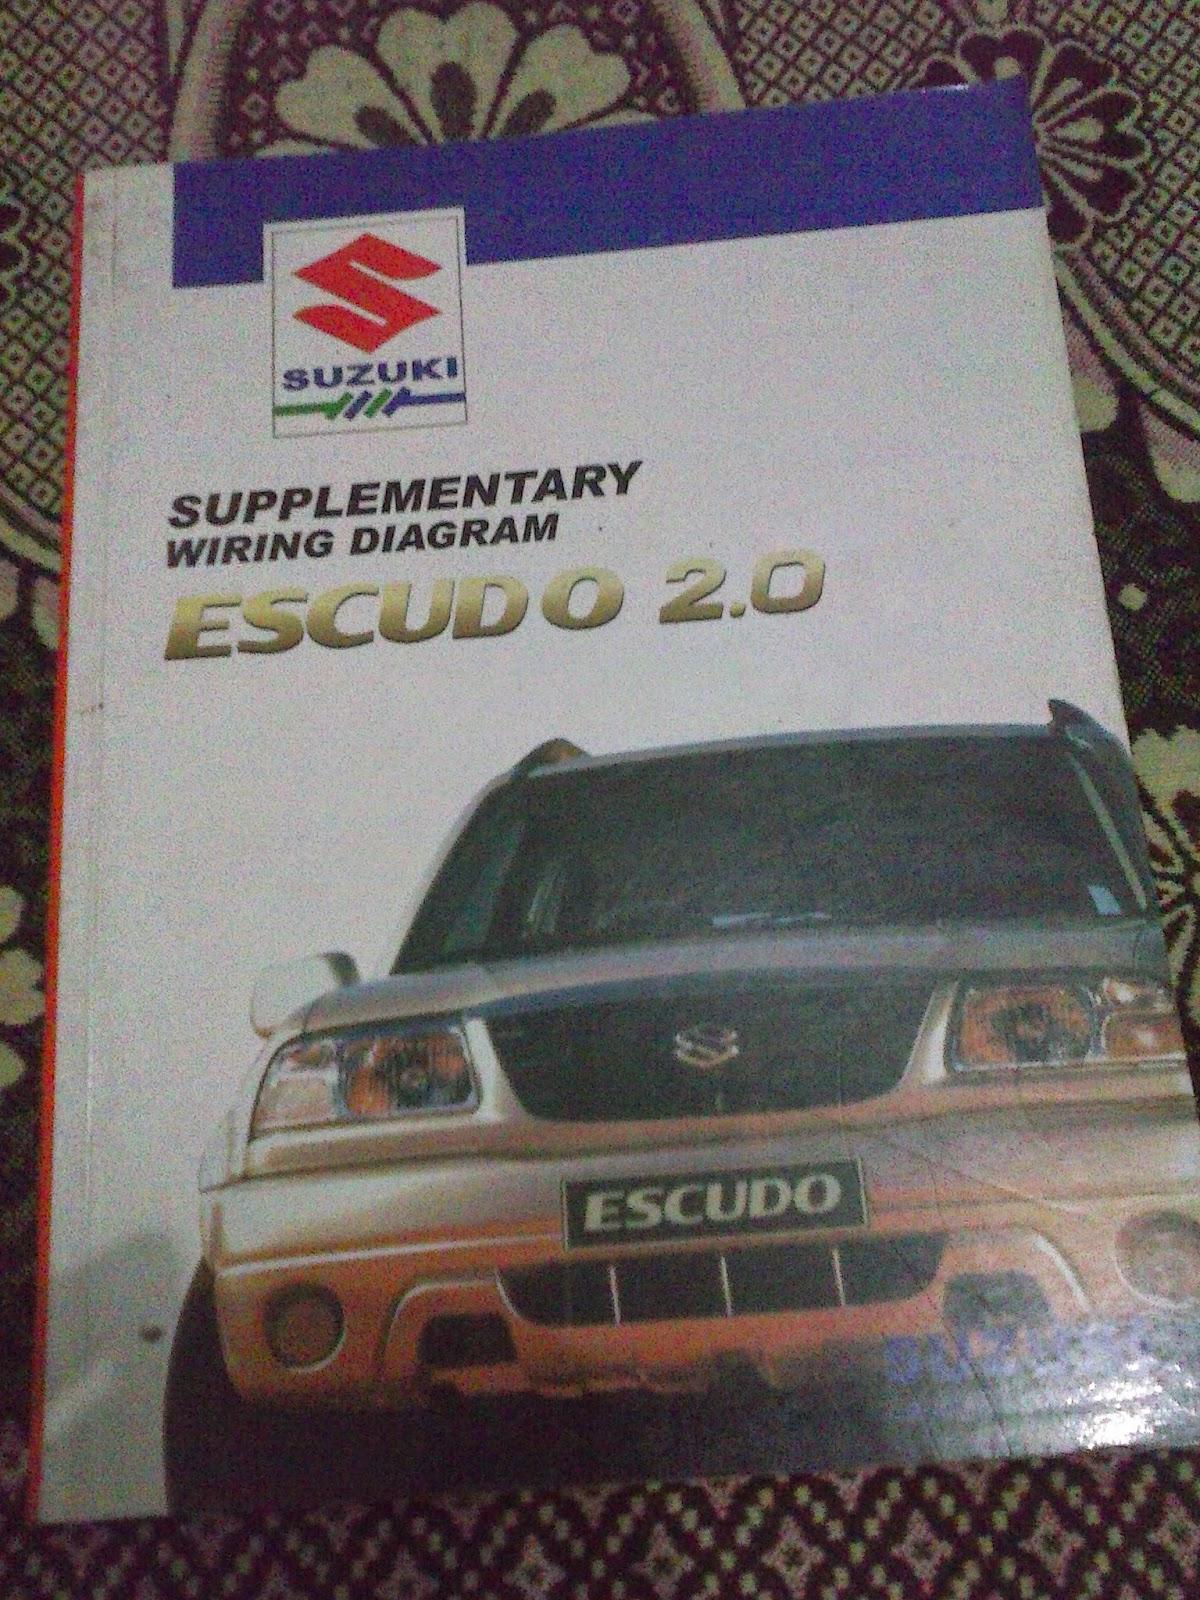 Wiring Diagram Suzuki Escudo 2.0 Rp. 750.000,-